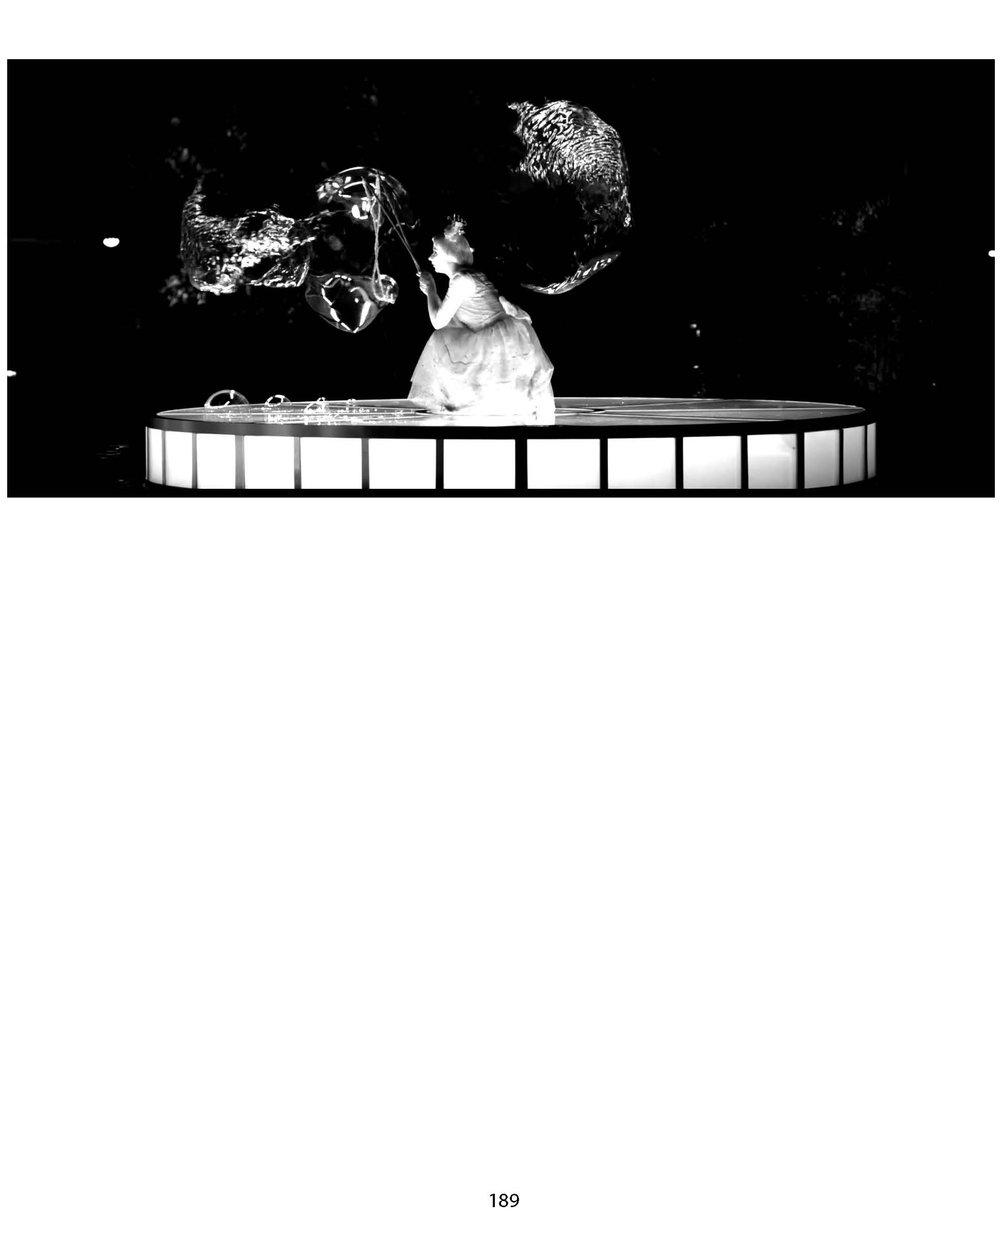 256_Final_Page_189.jpg